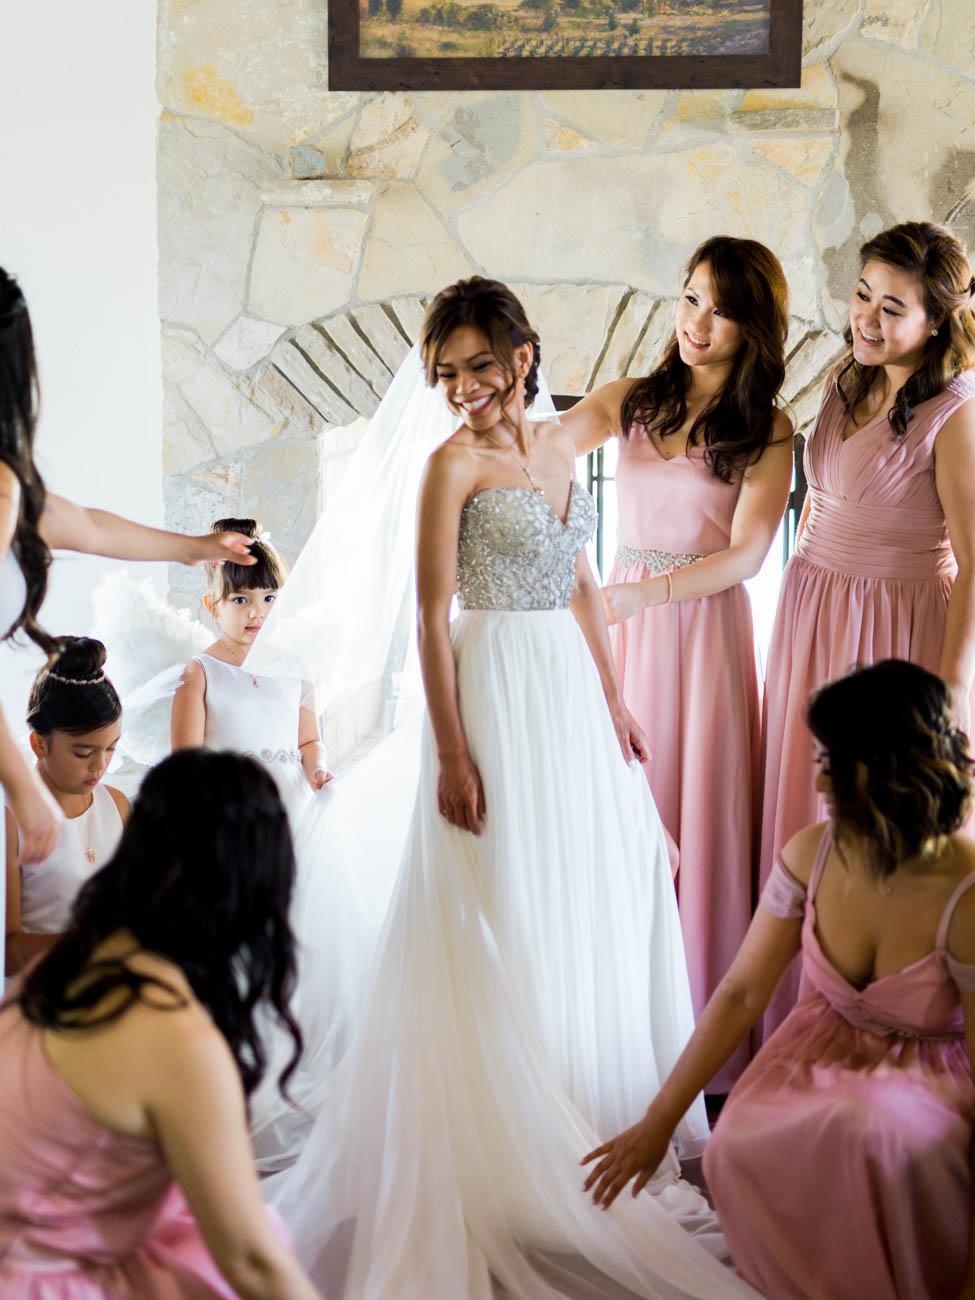 dennisroycoronel_wedding-18.jpg